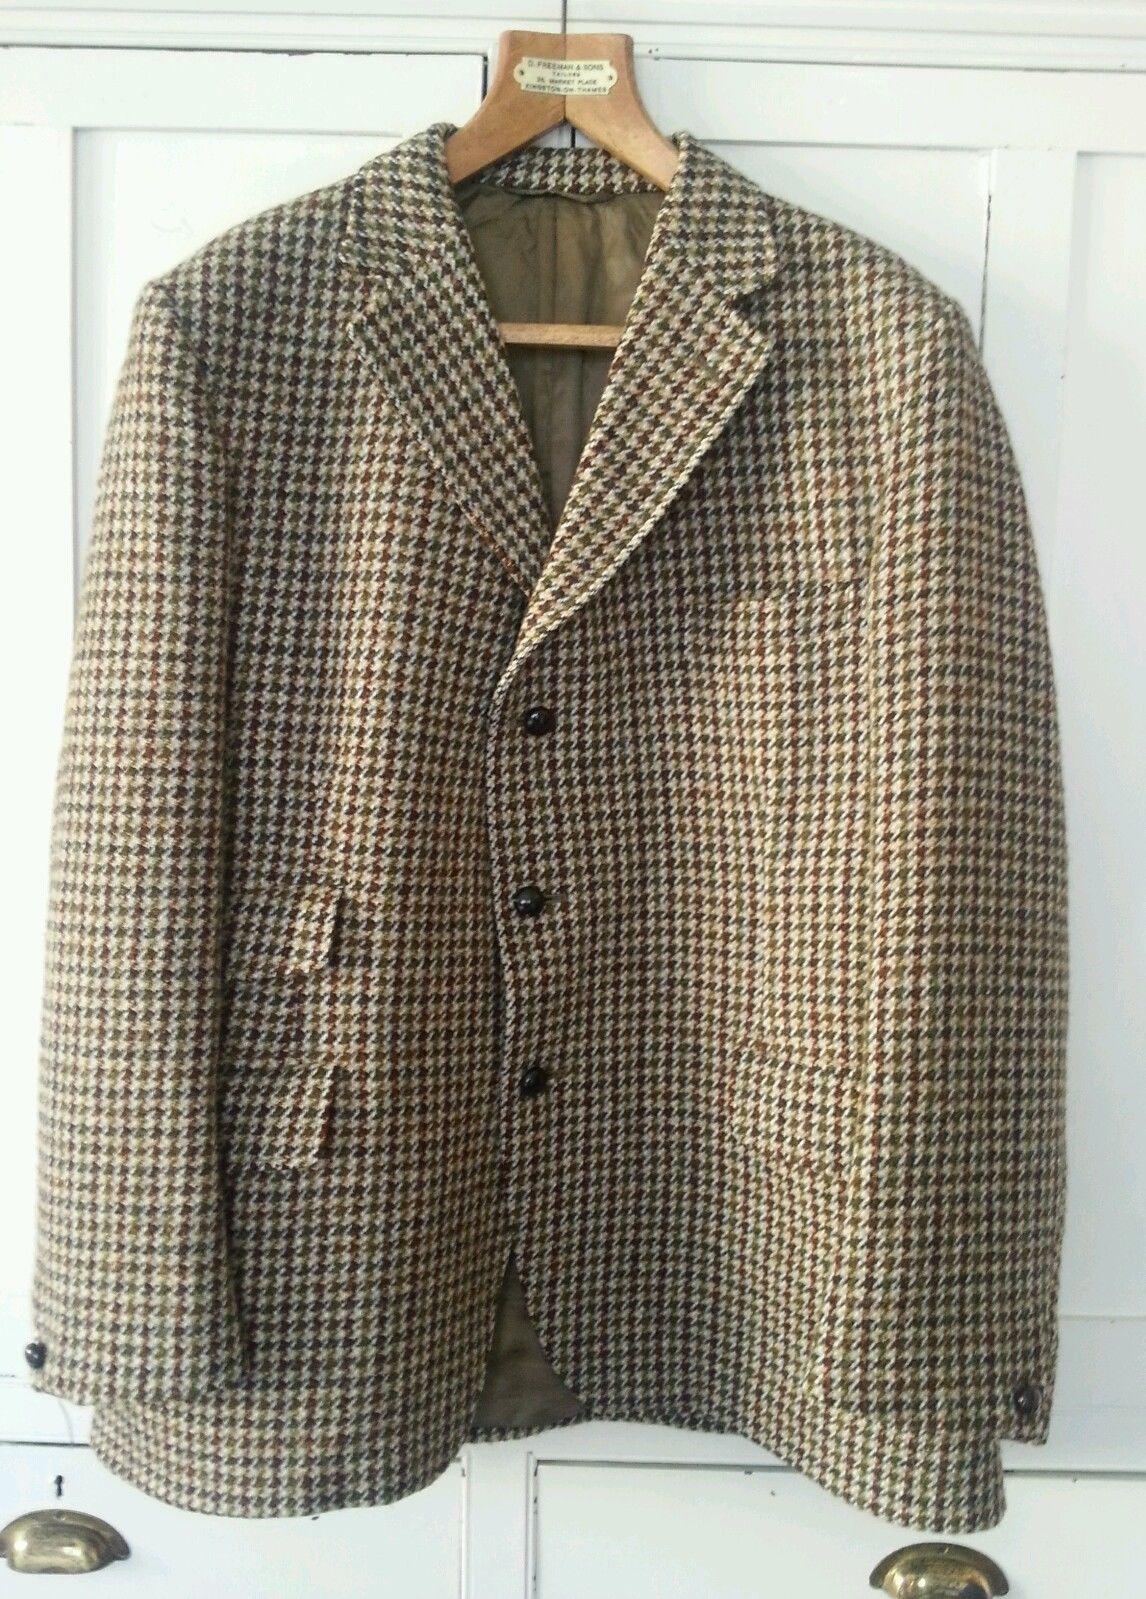 Vintage Dunn & Co Tweed Jacket KDJt96